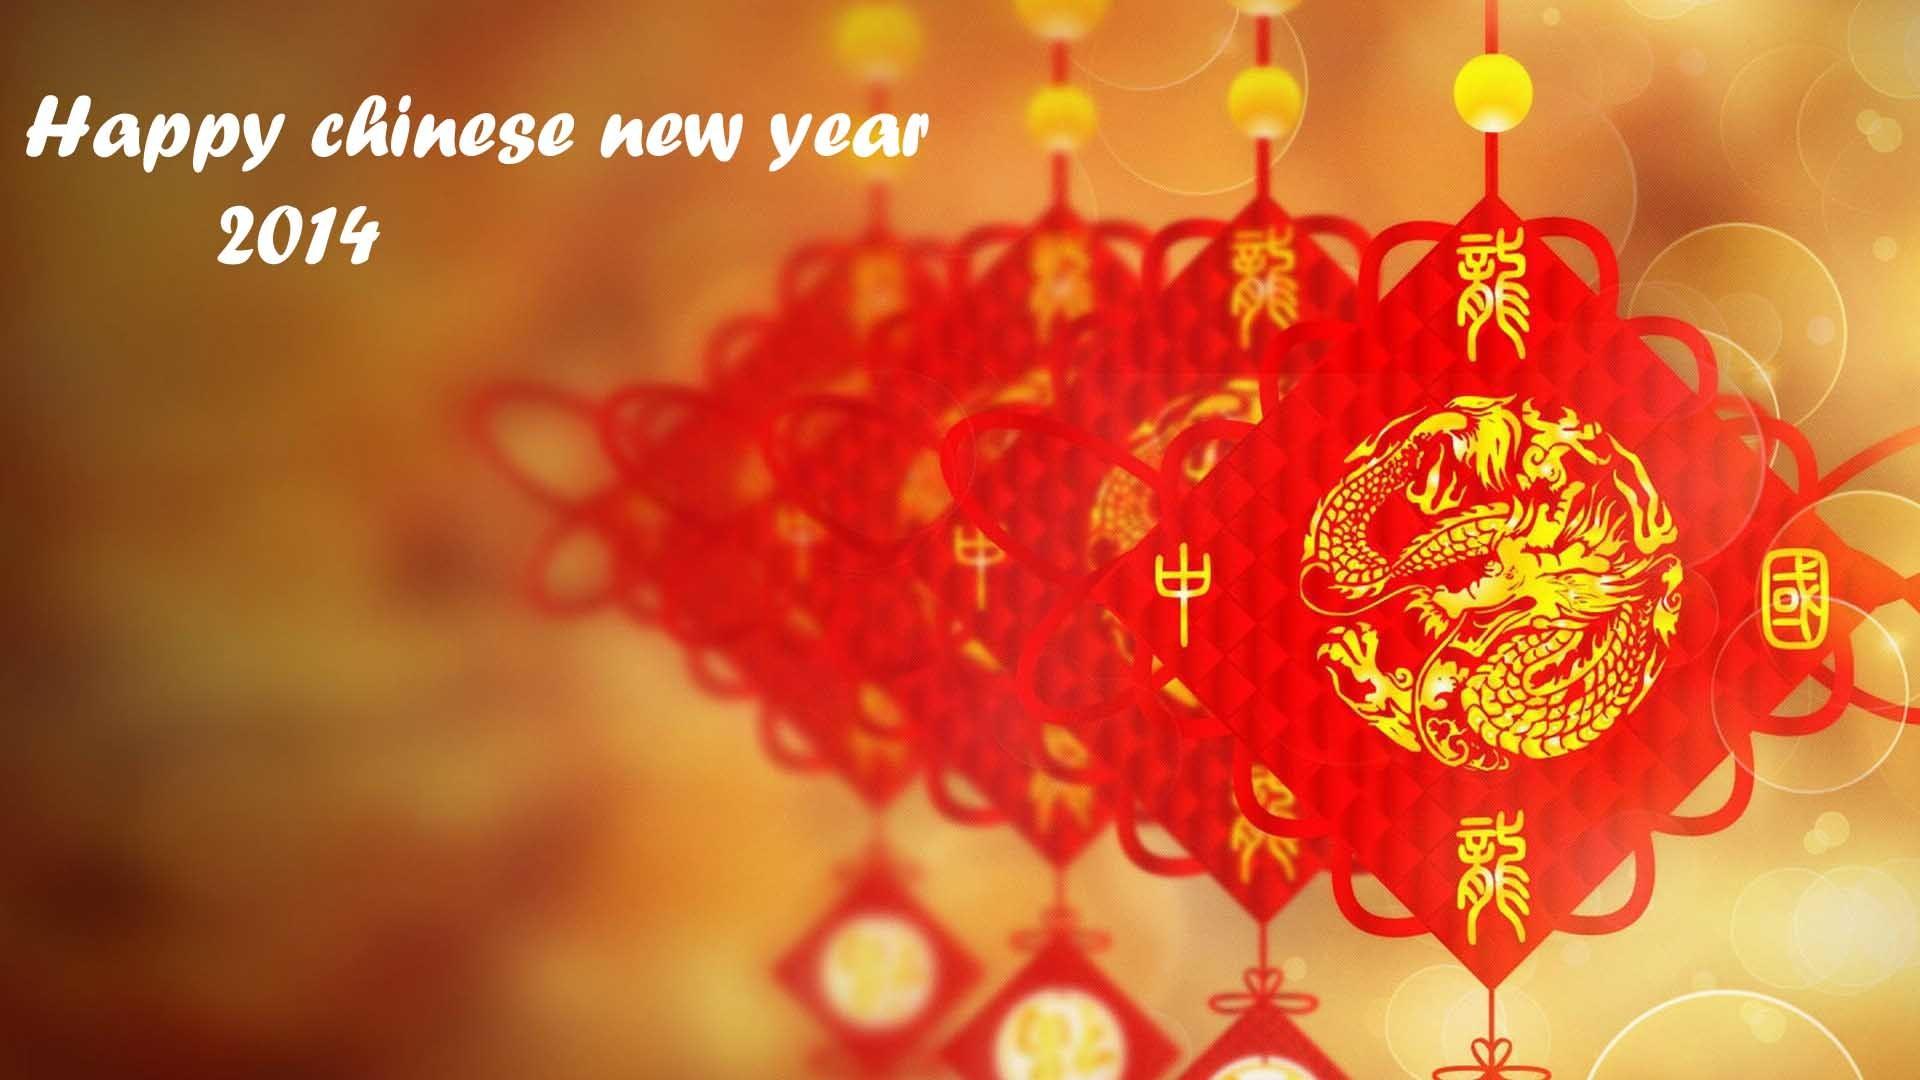 Chinese New Year 2014 Wallpaper 3865